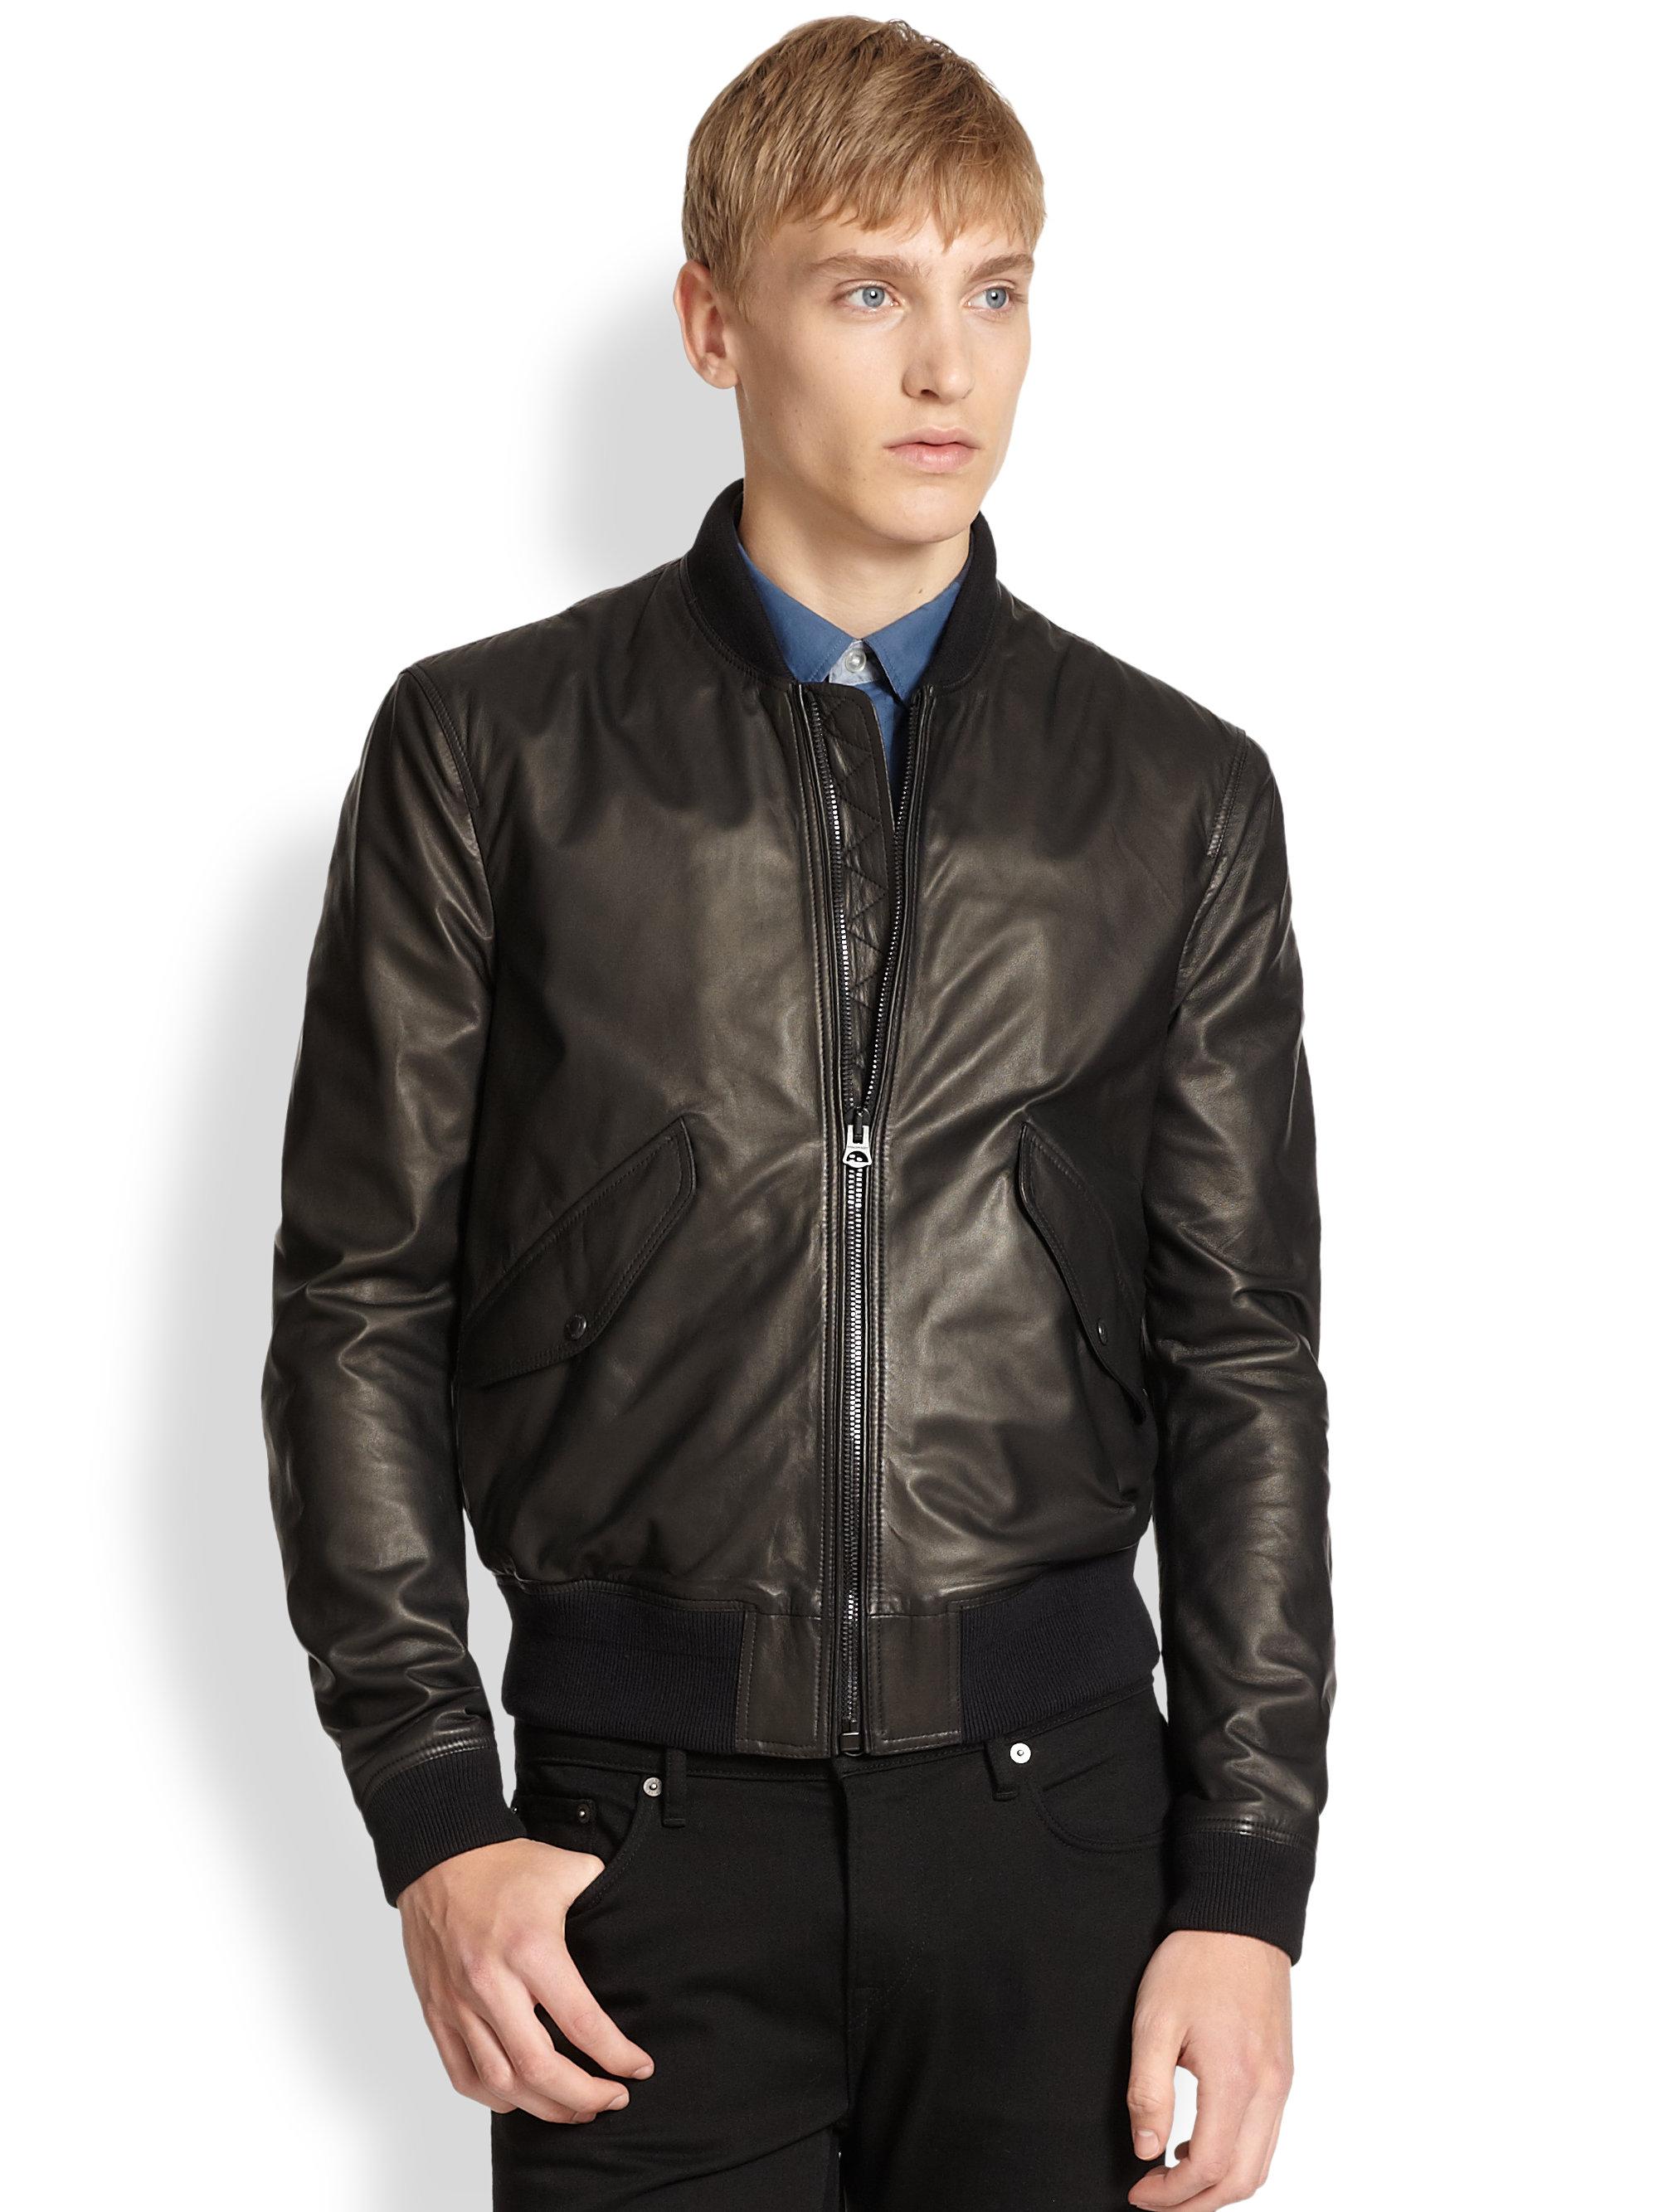 Mens leather blouson jacket